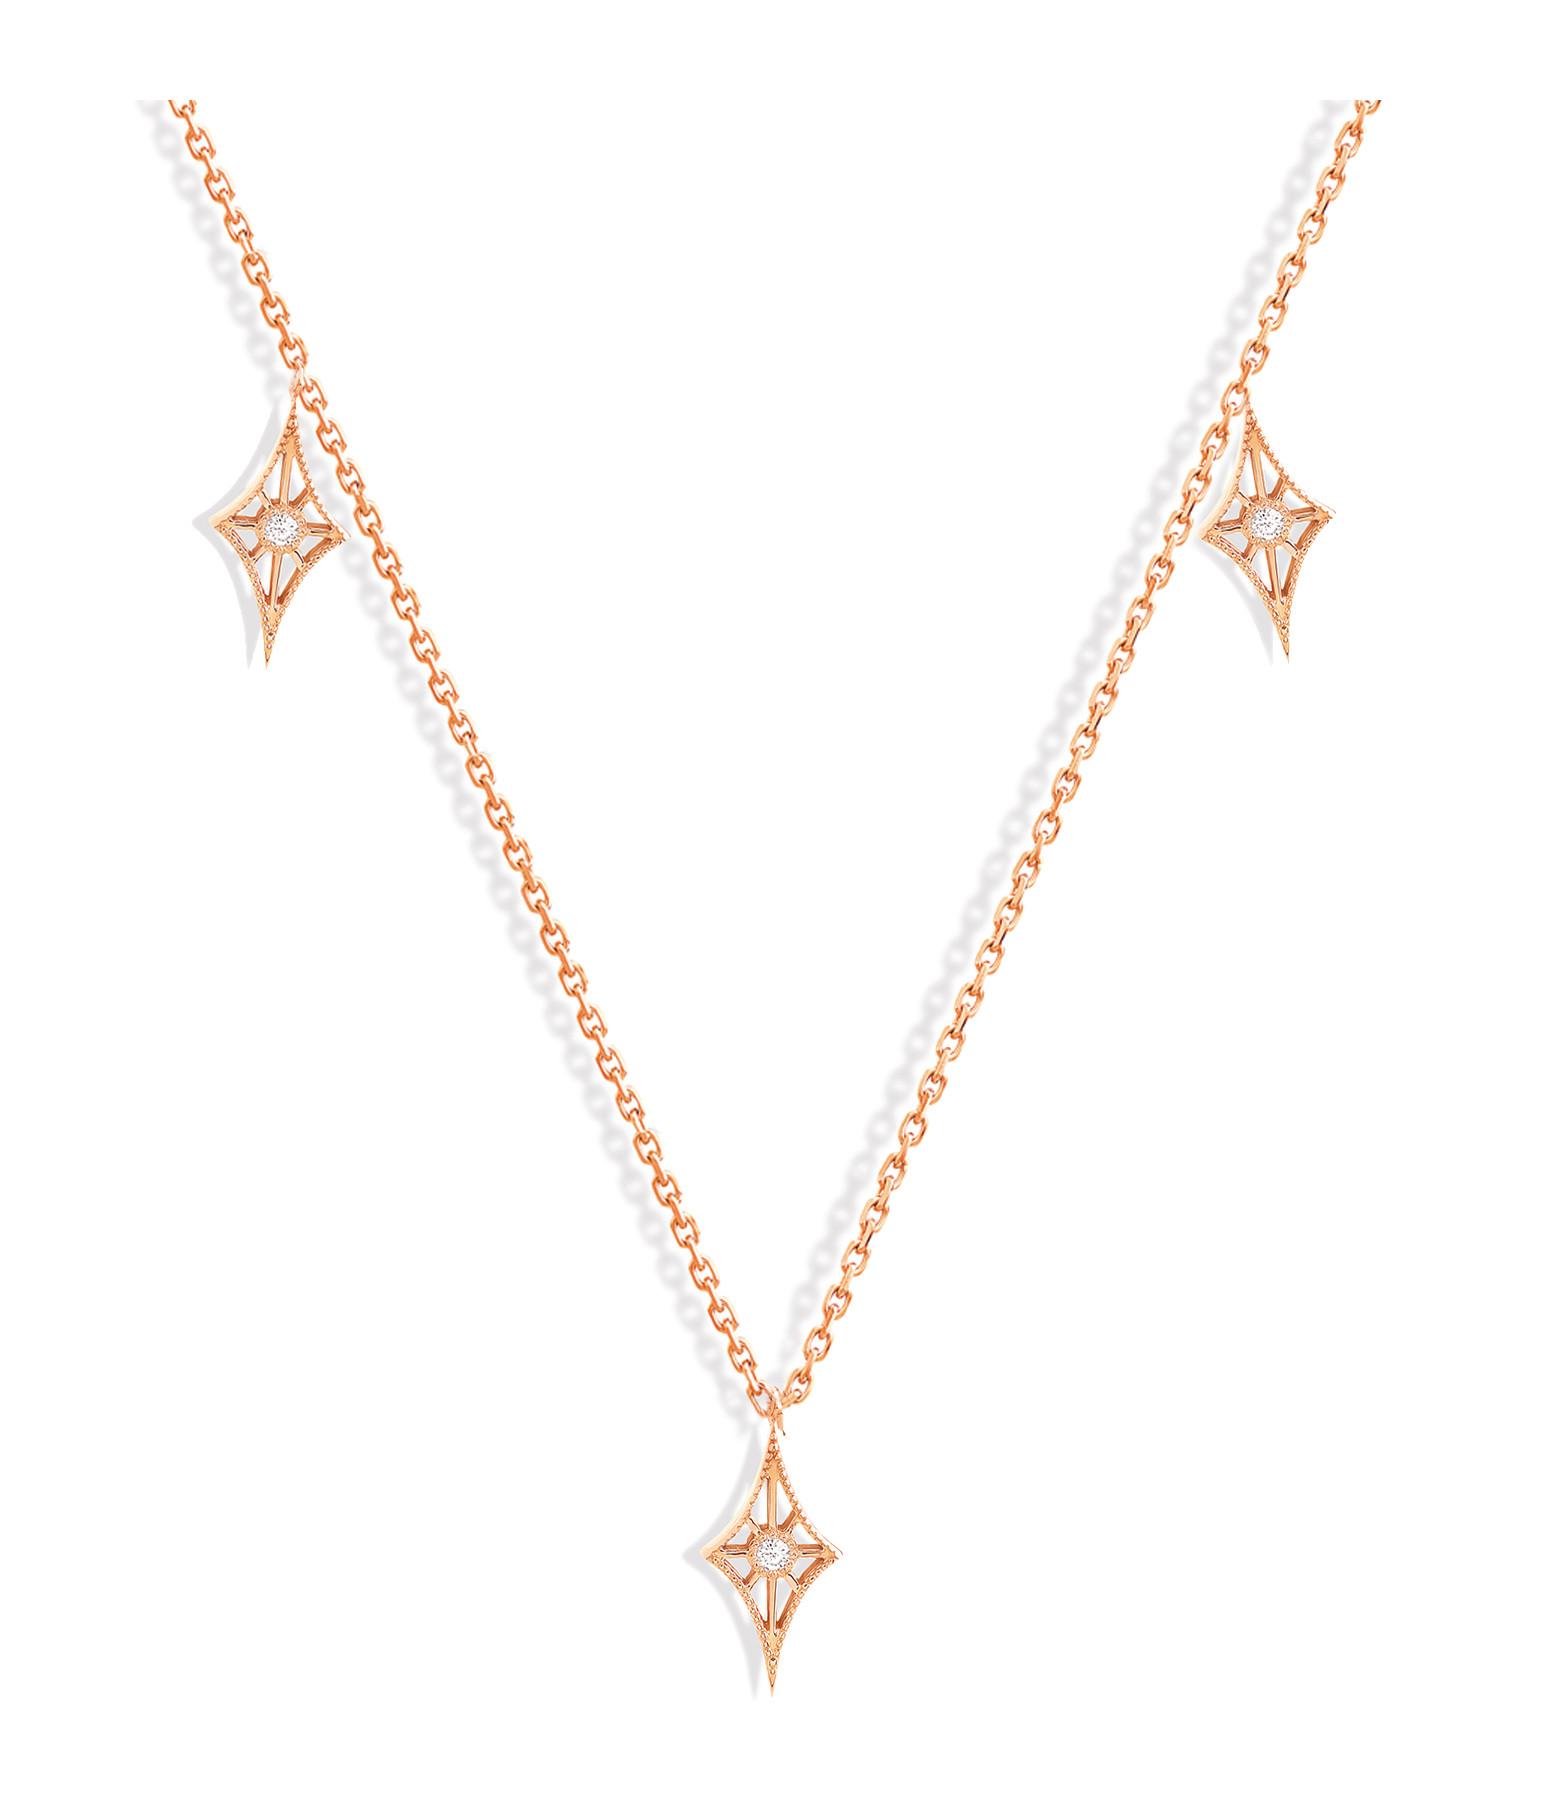 NAVA JOAILLERIE - Collier Cheyenne Mini-Losange Diamants Or Rose